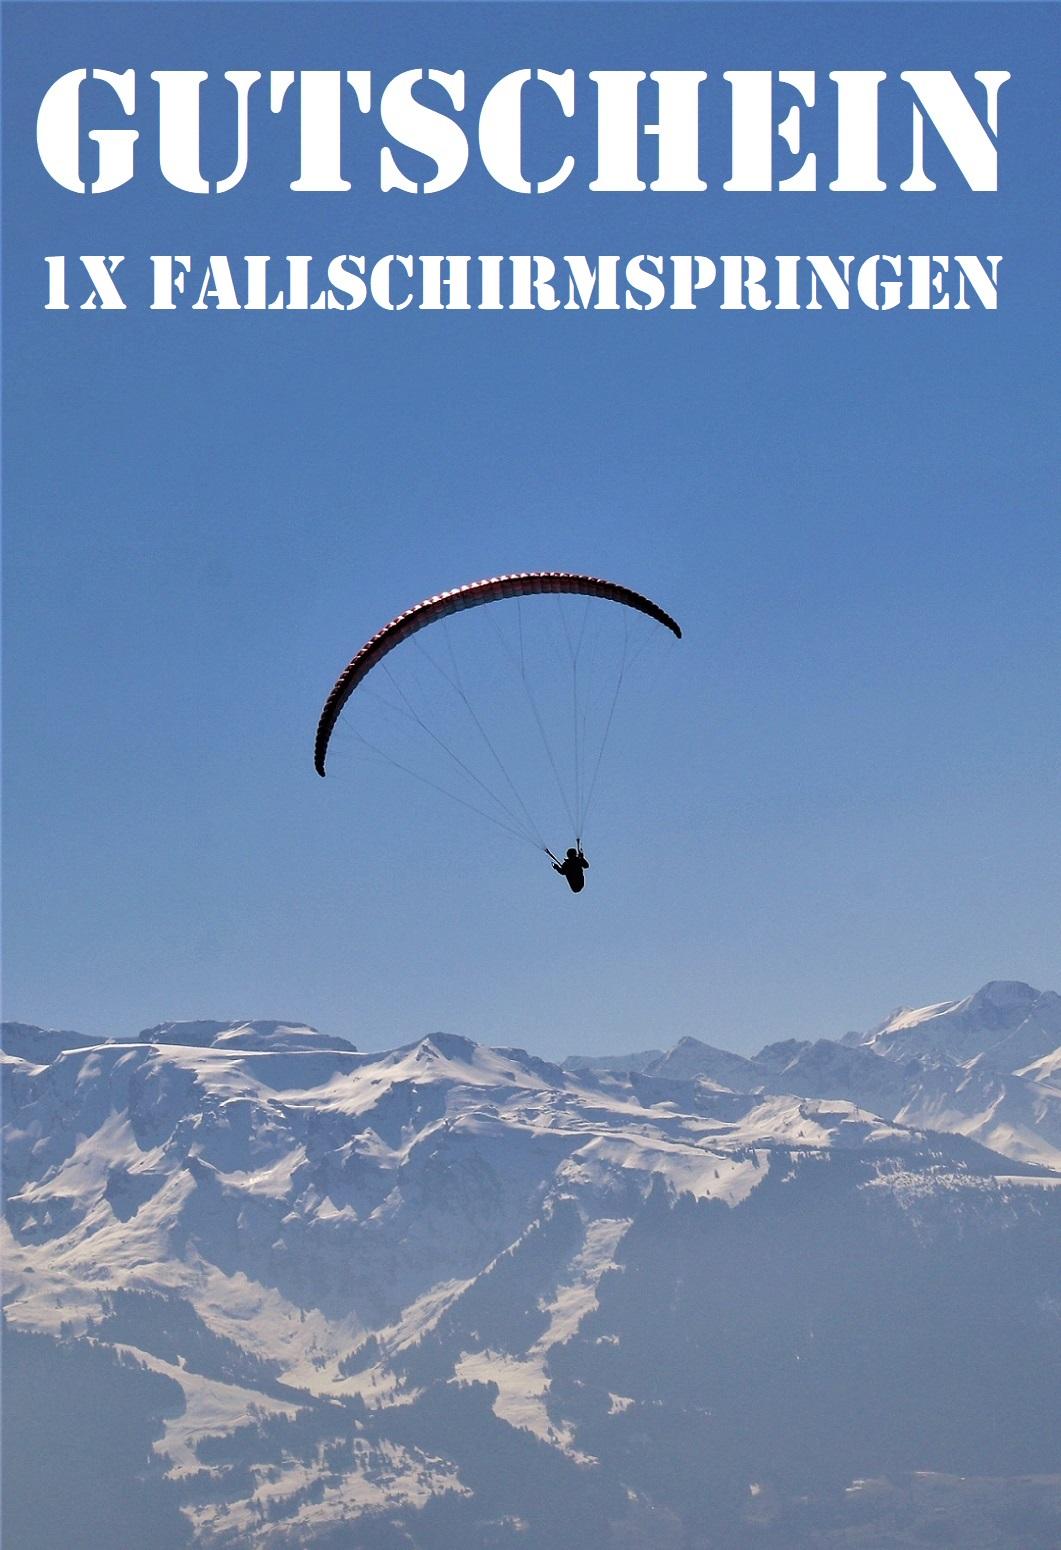 Tandem Gutschein Yuu Skydive E V Fallschirm